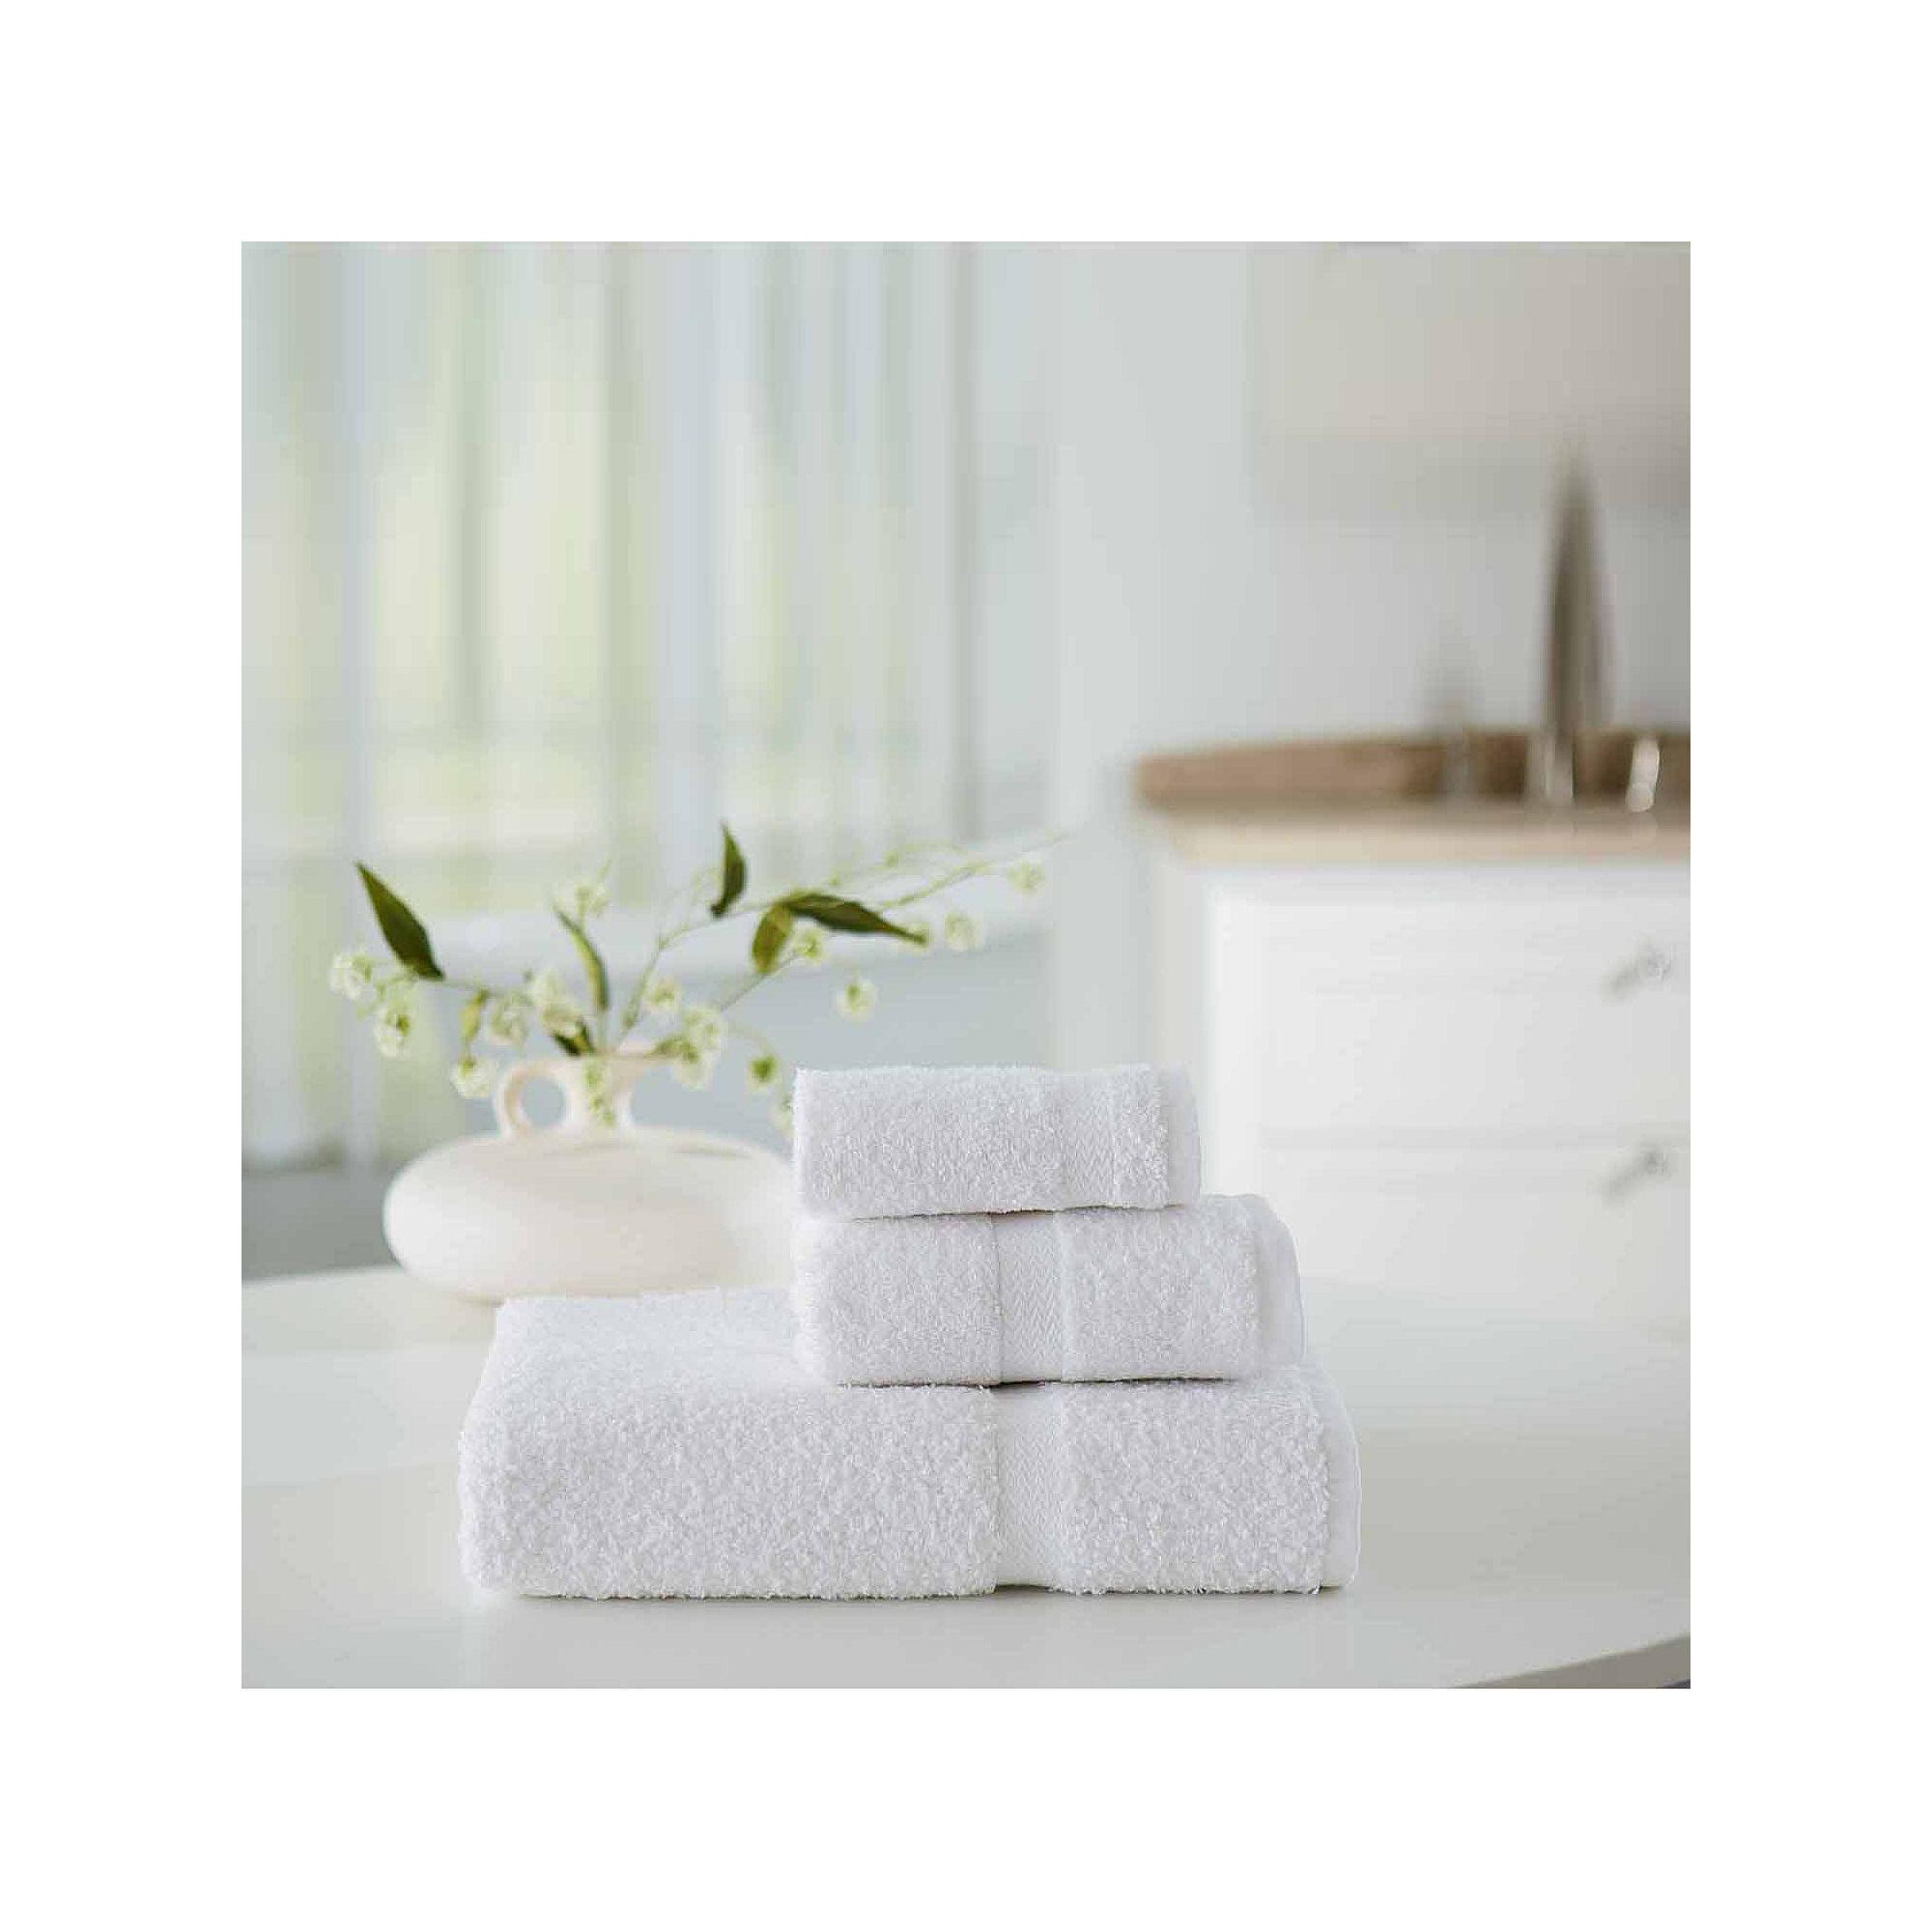 Welington 36-pc. 27x56 Bath Towel Set